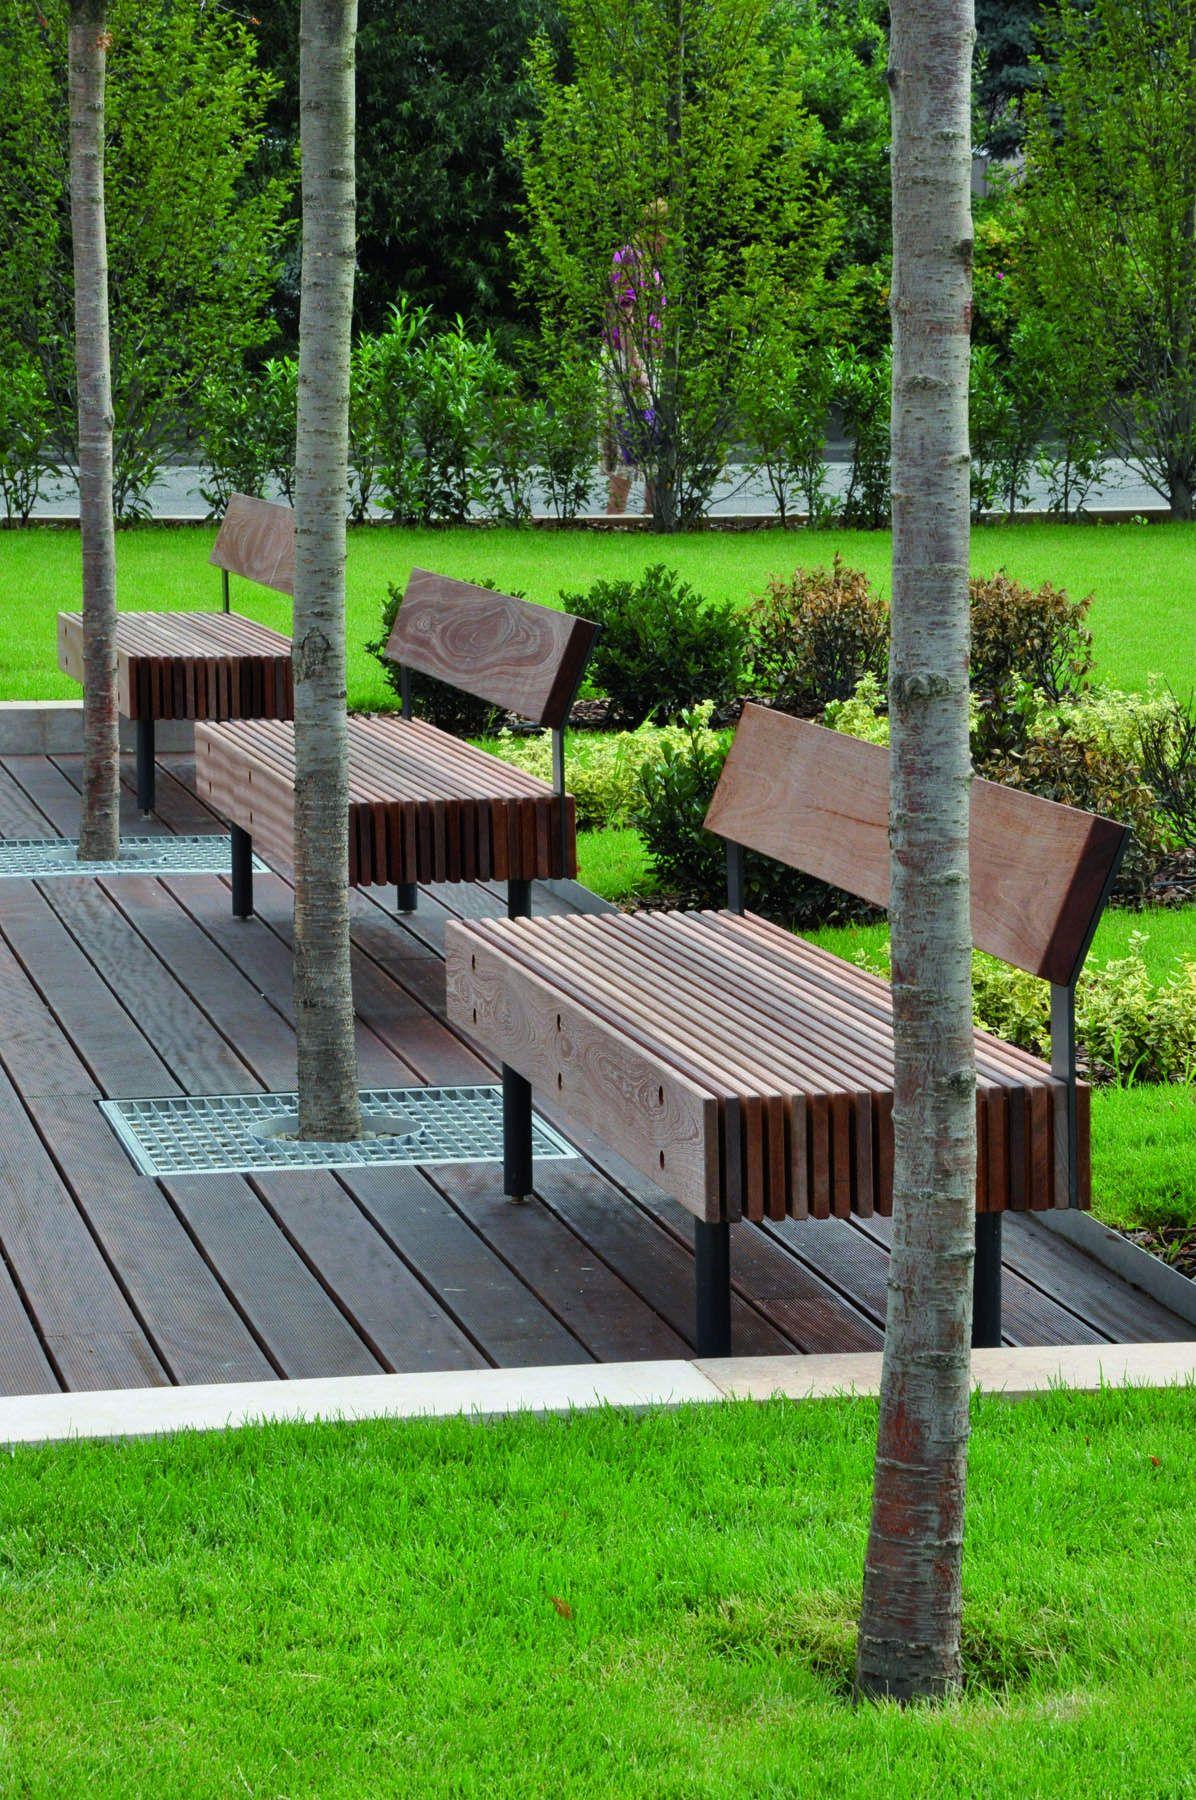 Banco Modelo E49 Bench Wood Modern Urban Furniture  # Meble Narcisse